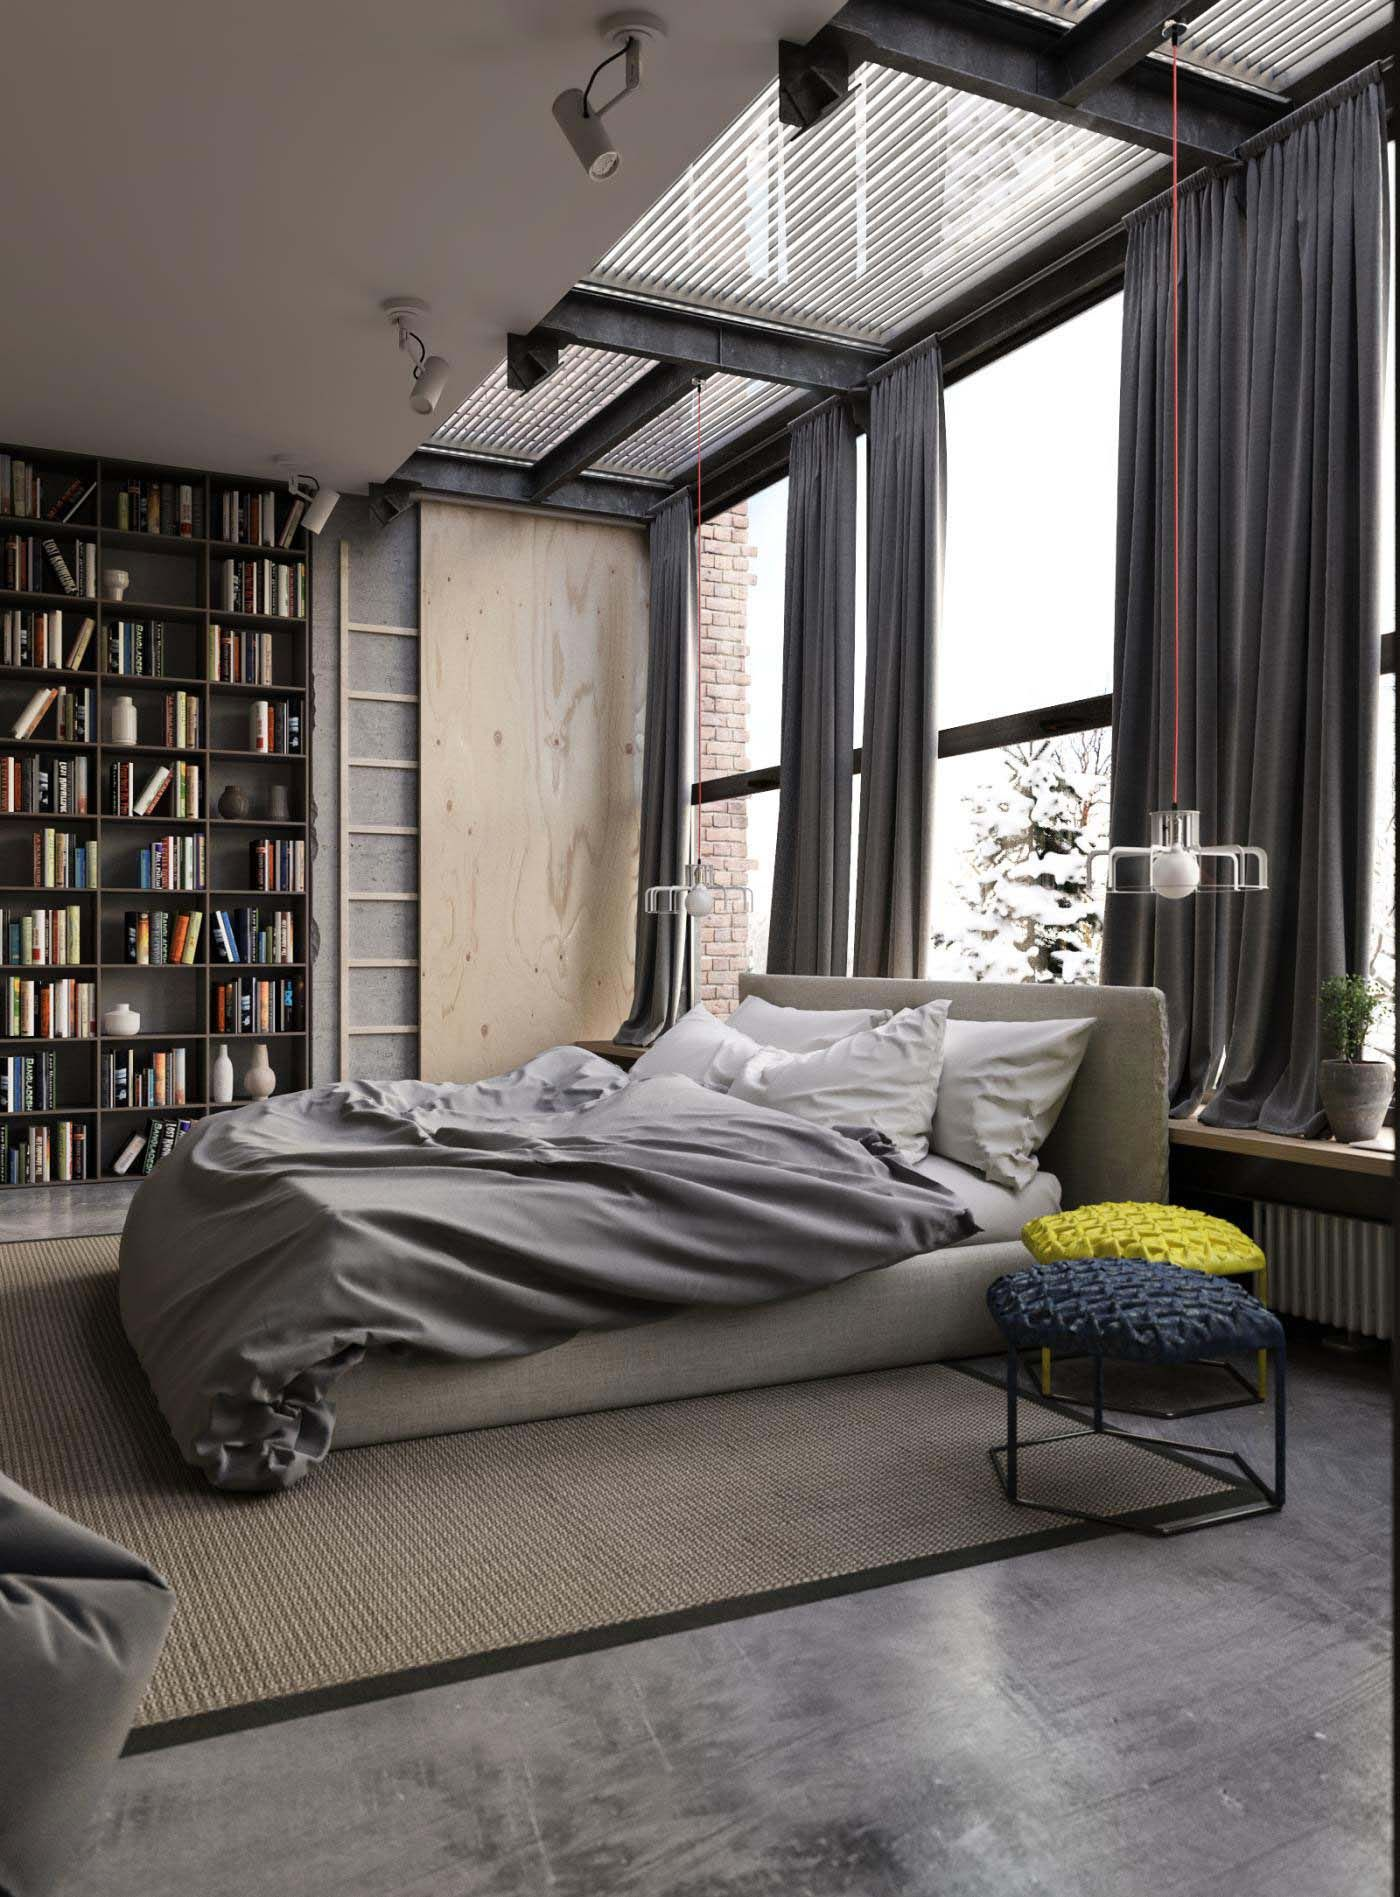 Industrial Chic Bedroom Decor